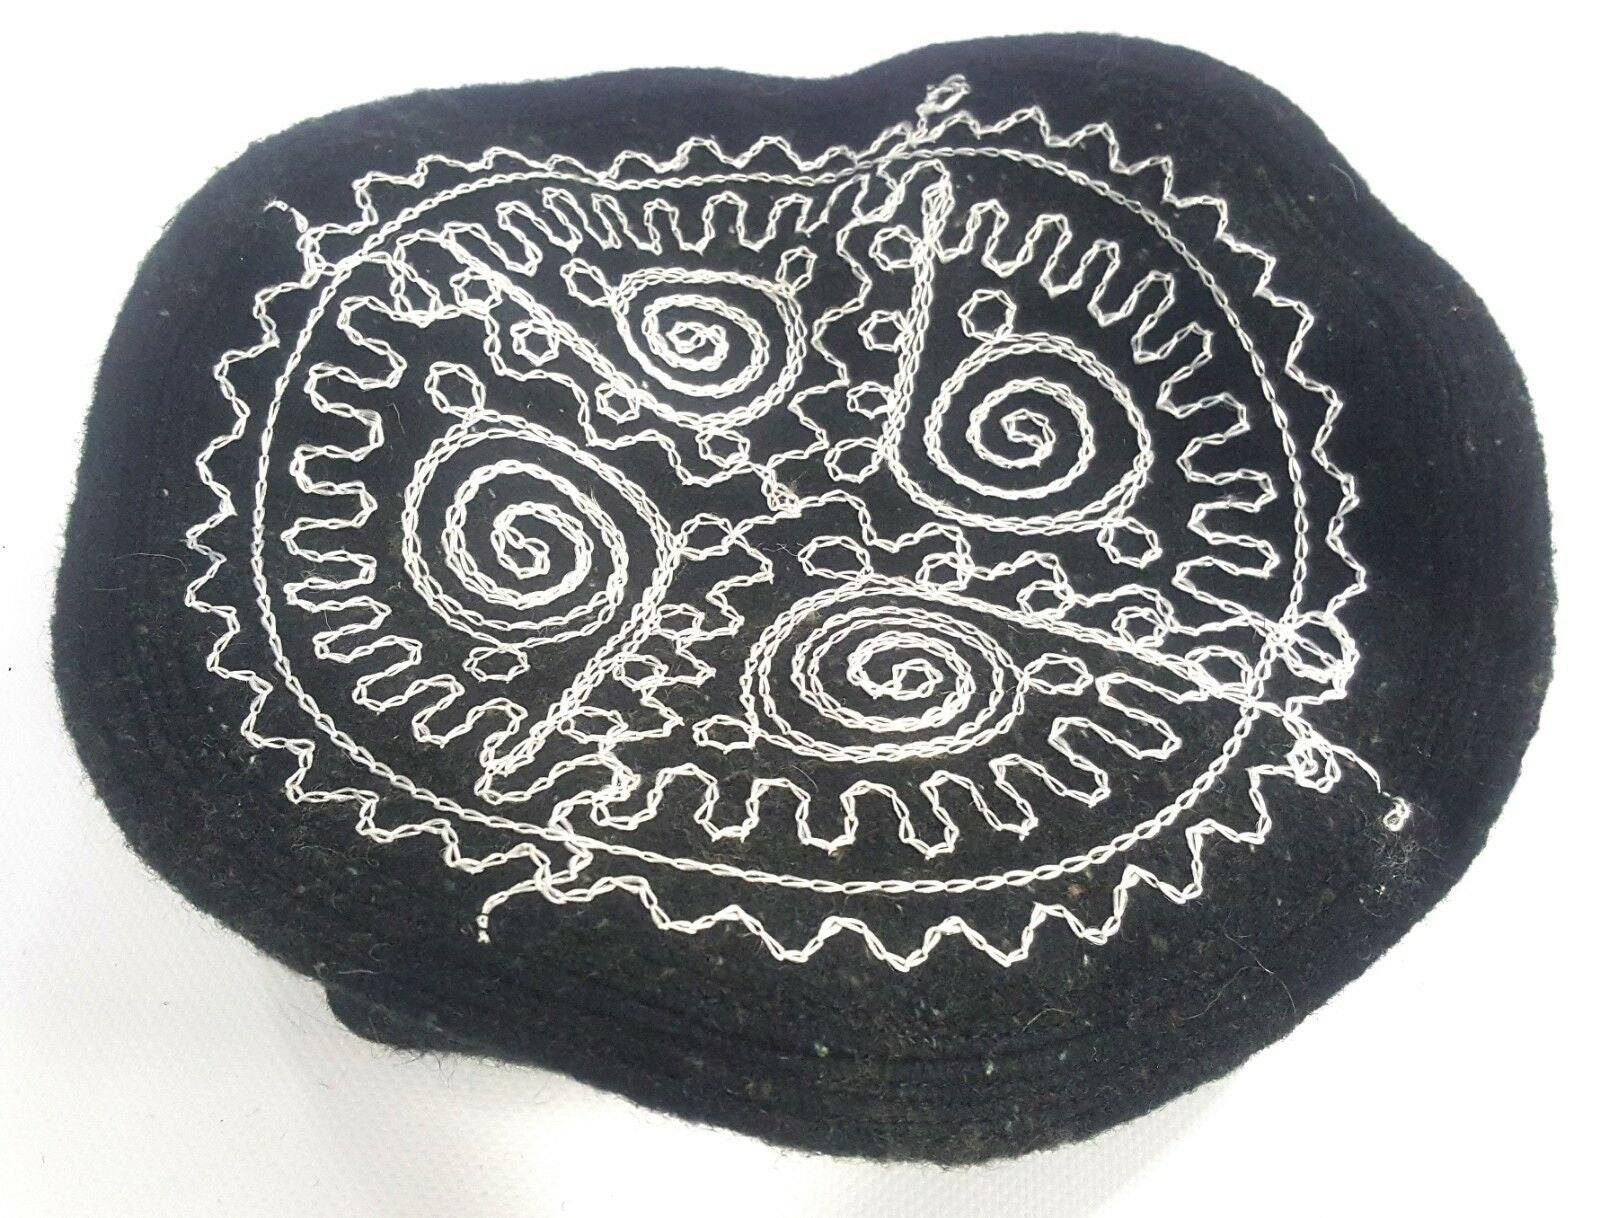 Embroidered Black Pakol Pakul Afghan Donut Hat Beret Chitral Etsy